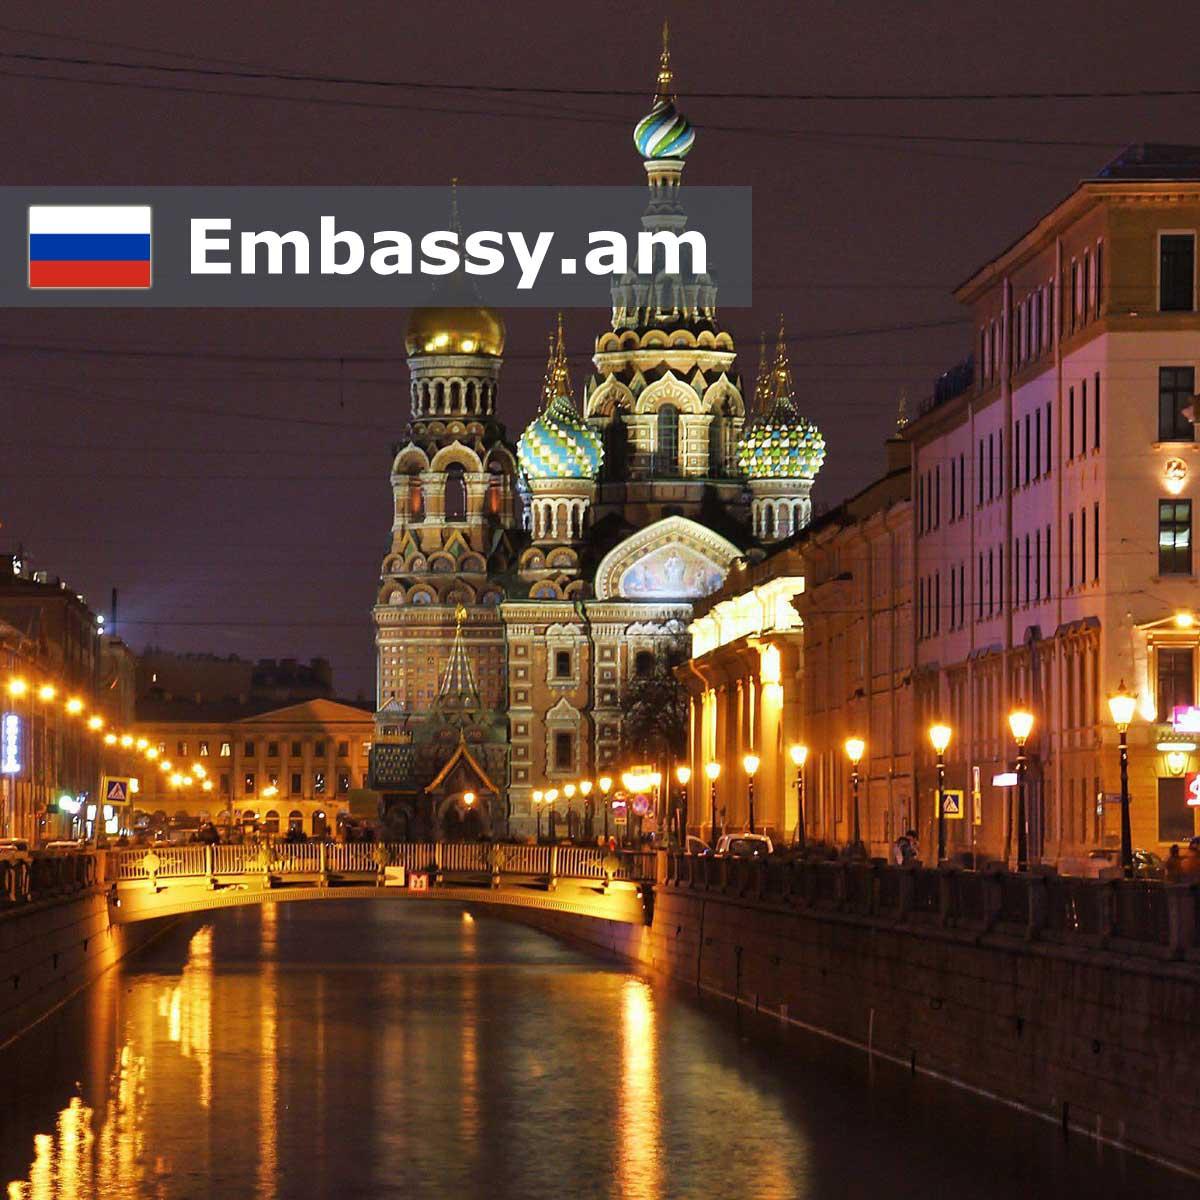 Saint Petersburg - Hotels in Russia - Embassy.am